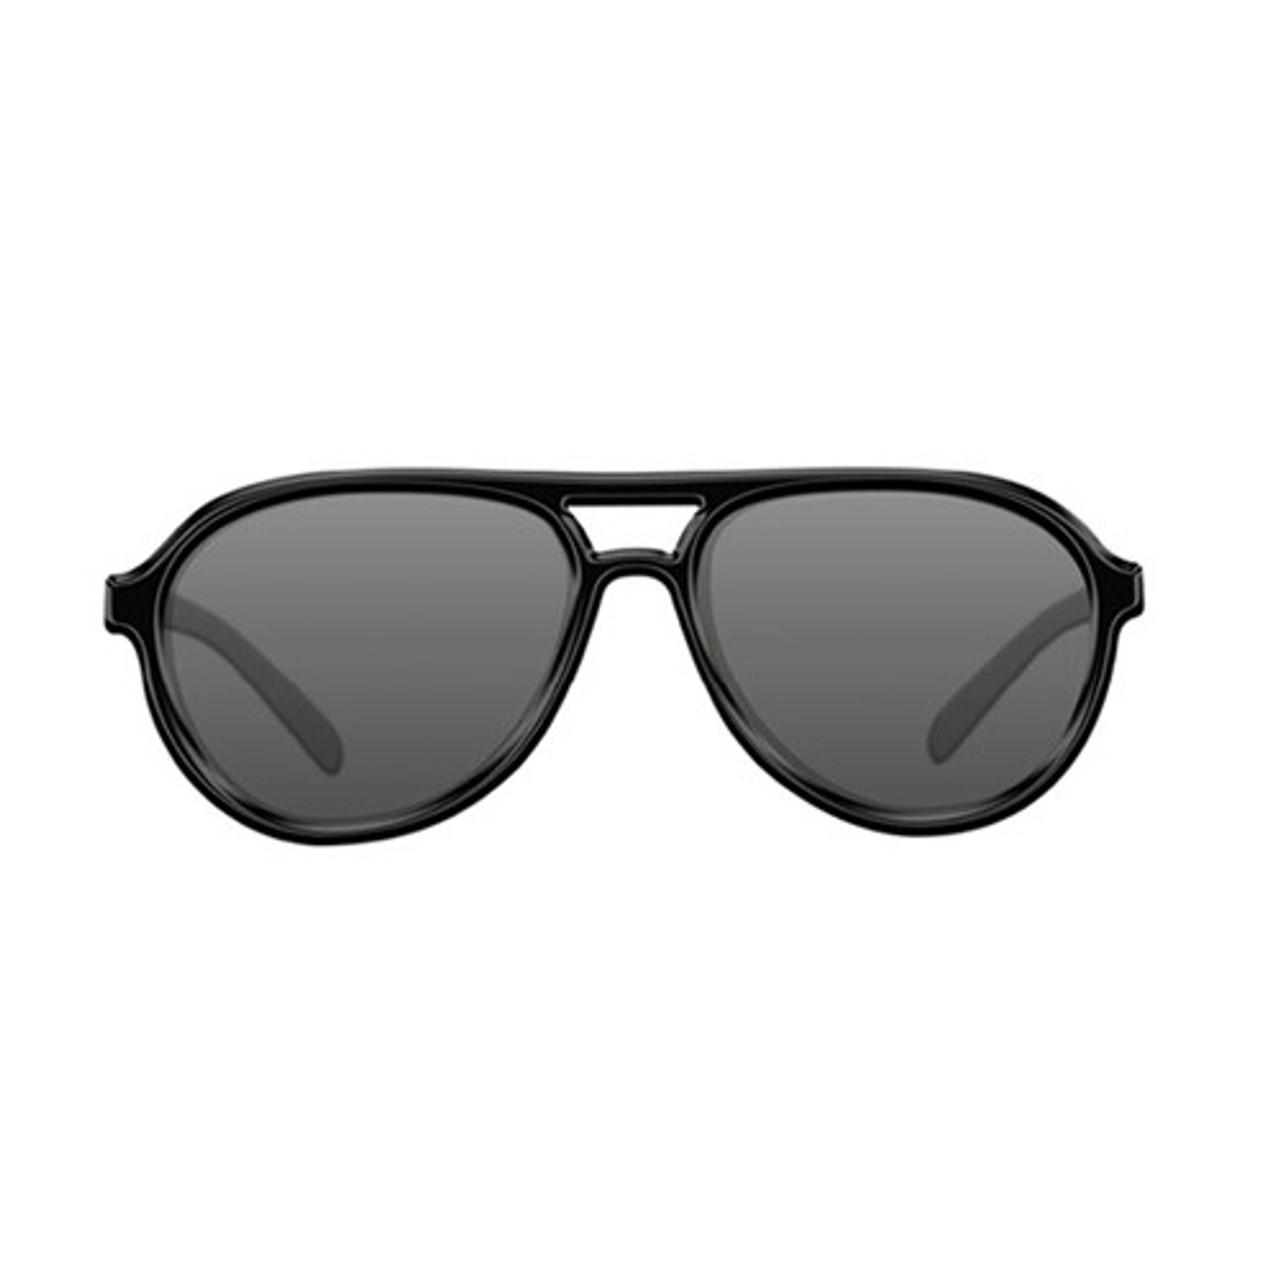 Fishing Korda 4th Dimension Sunglasses Accessories